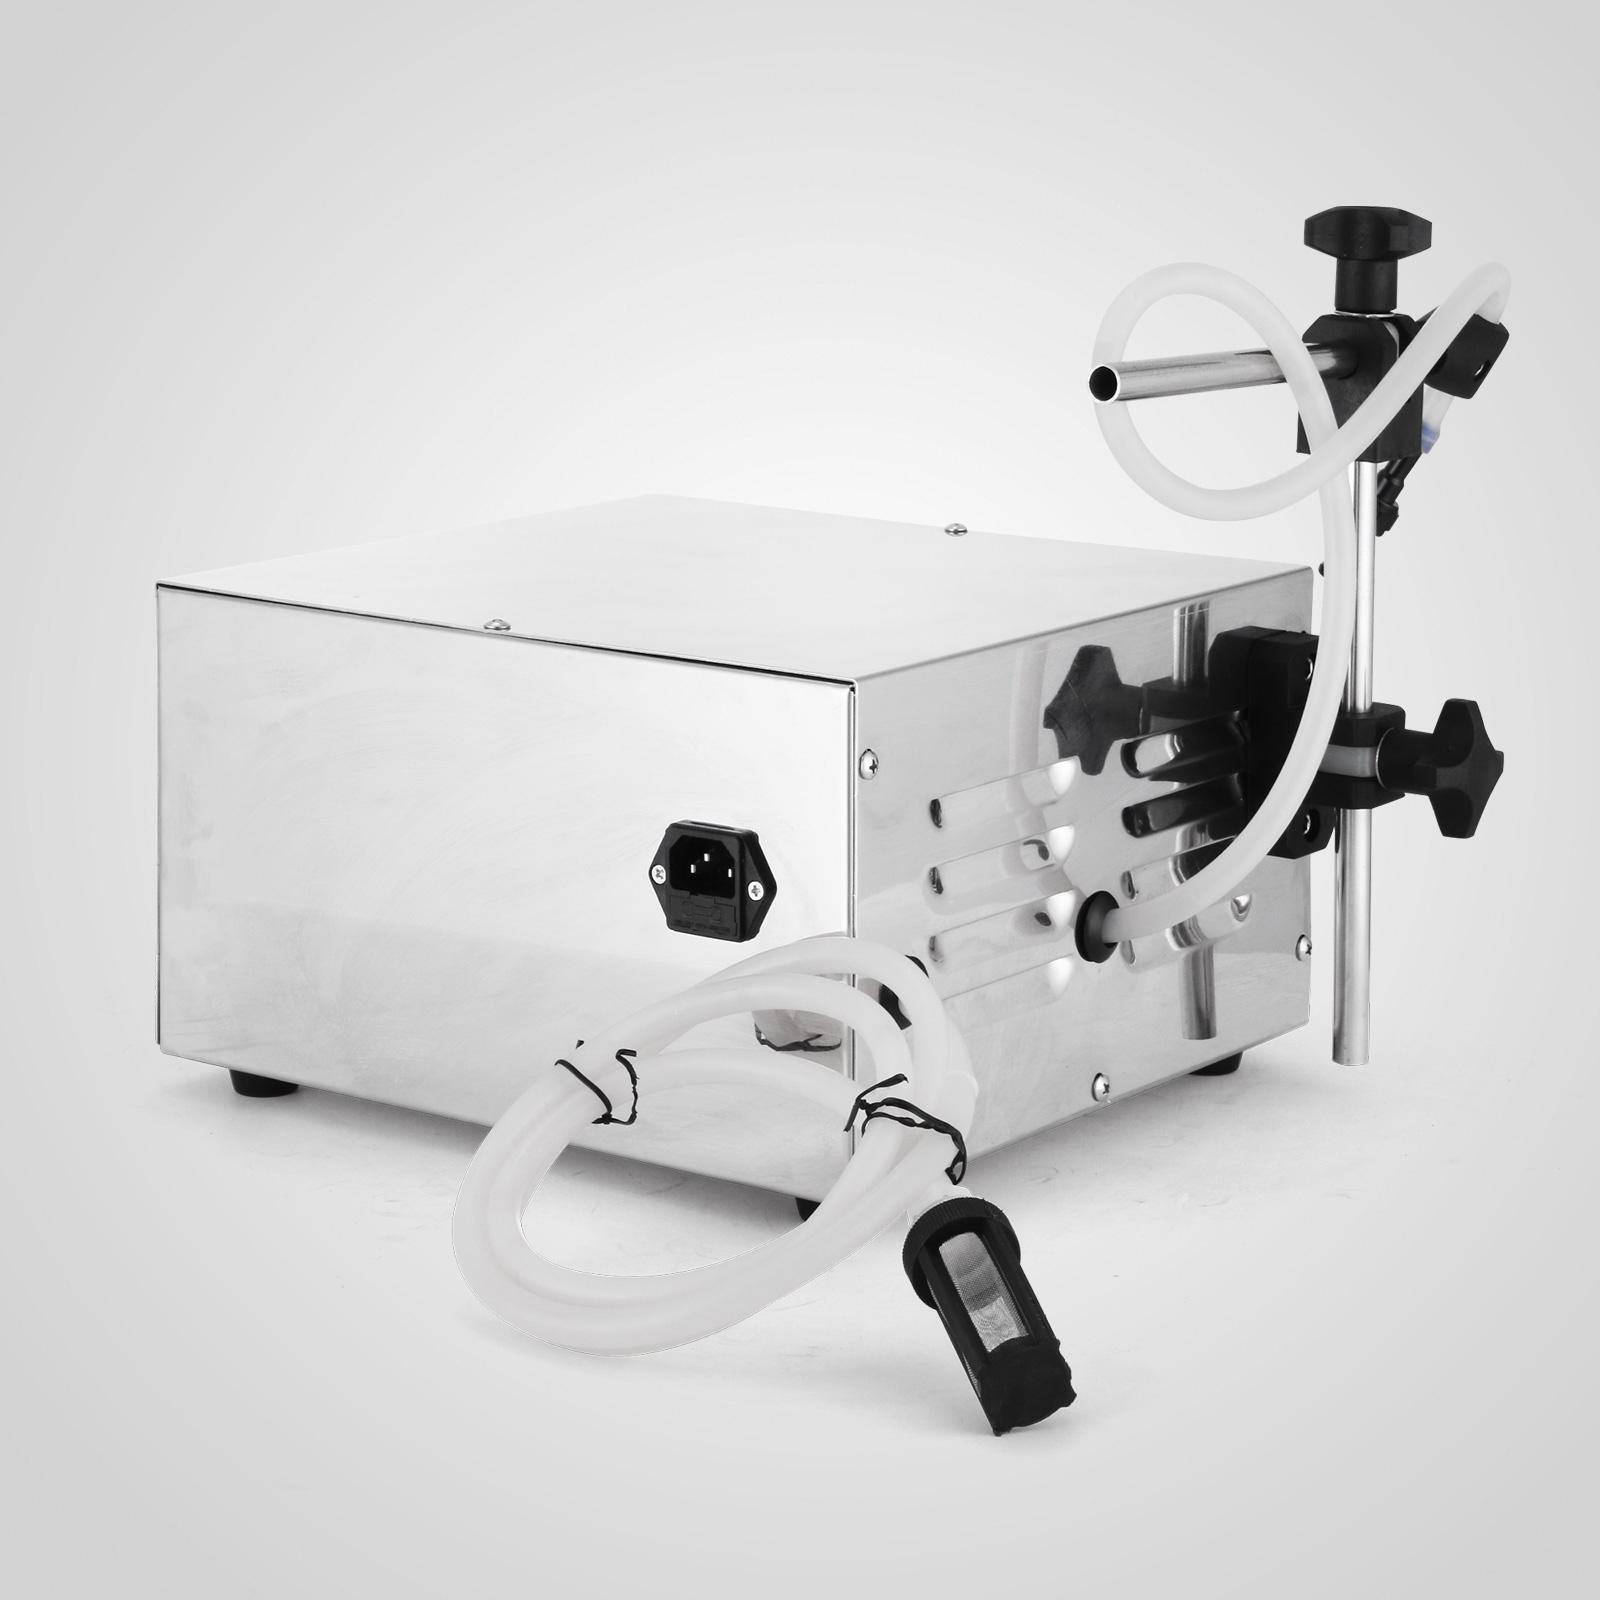 Liquid-Filling-Machine-Filler-Remplissage-2-3500ML-50-500ML-INDUSTRY-SUPPLY miniature 41